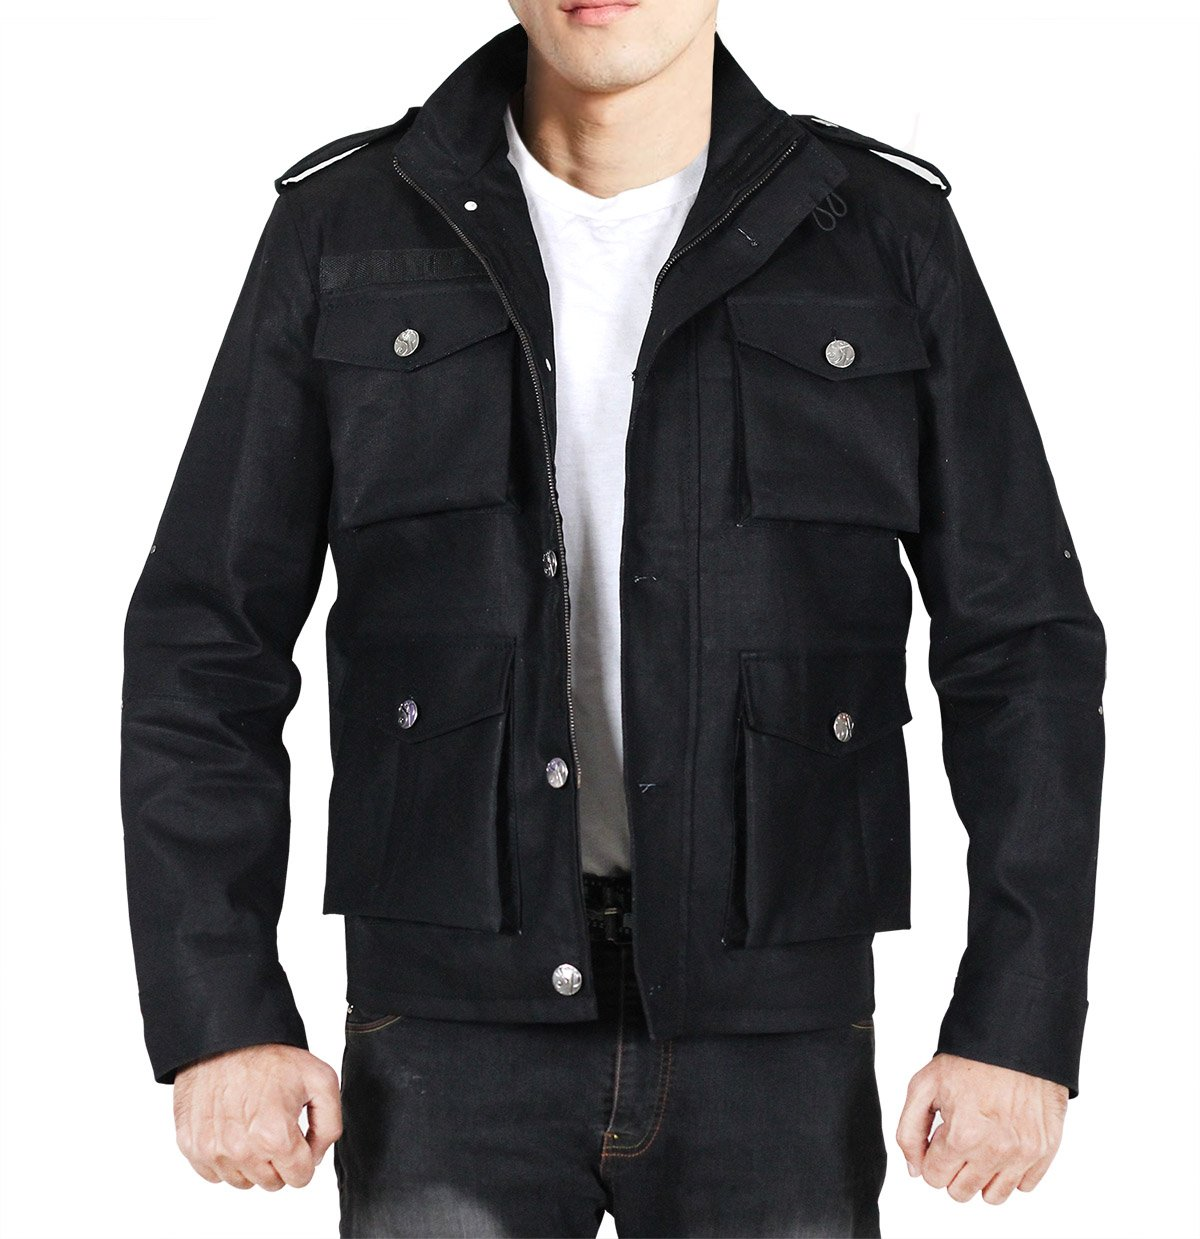 MPASSIONS Daredevil Punisher Jon Bernthal Black Cotton Jacket